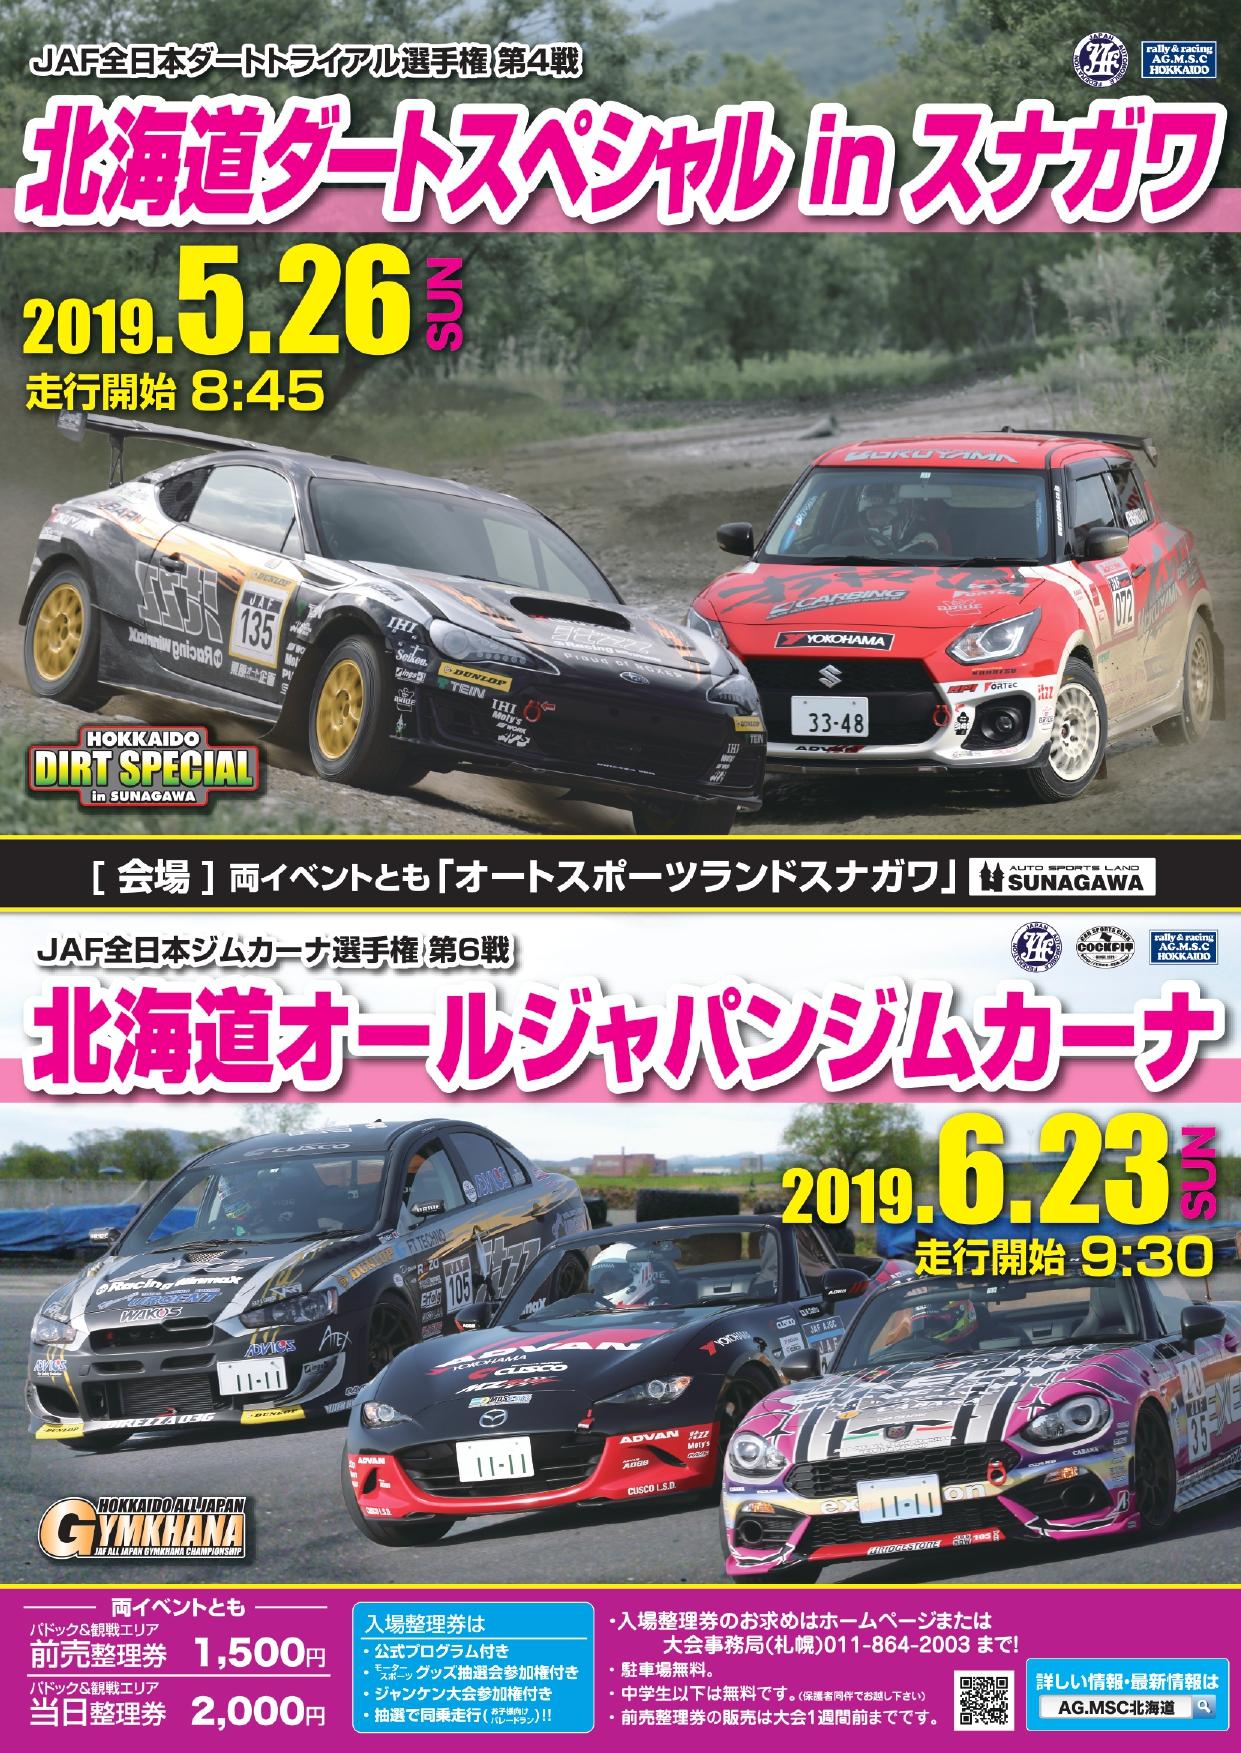 JAF全日本ダートトライアル選手権 第4戦北海道ダートスペシャル in スナガワ(2019年)のポスター